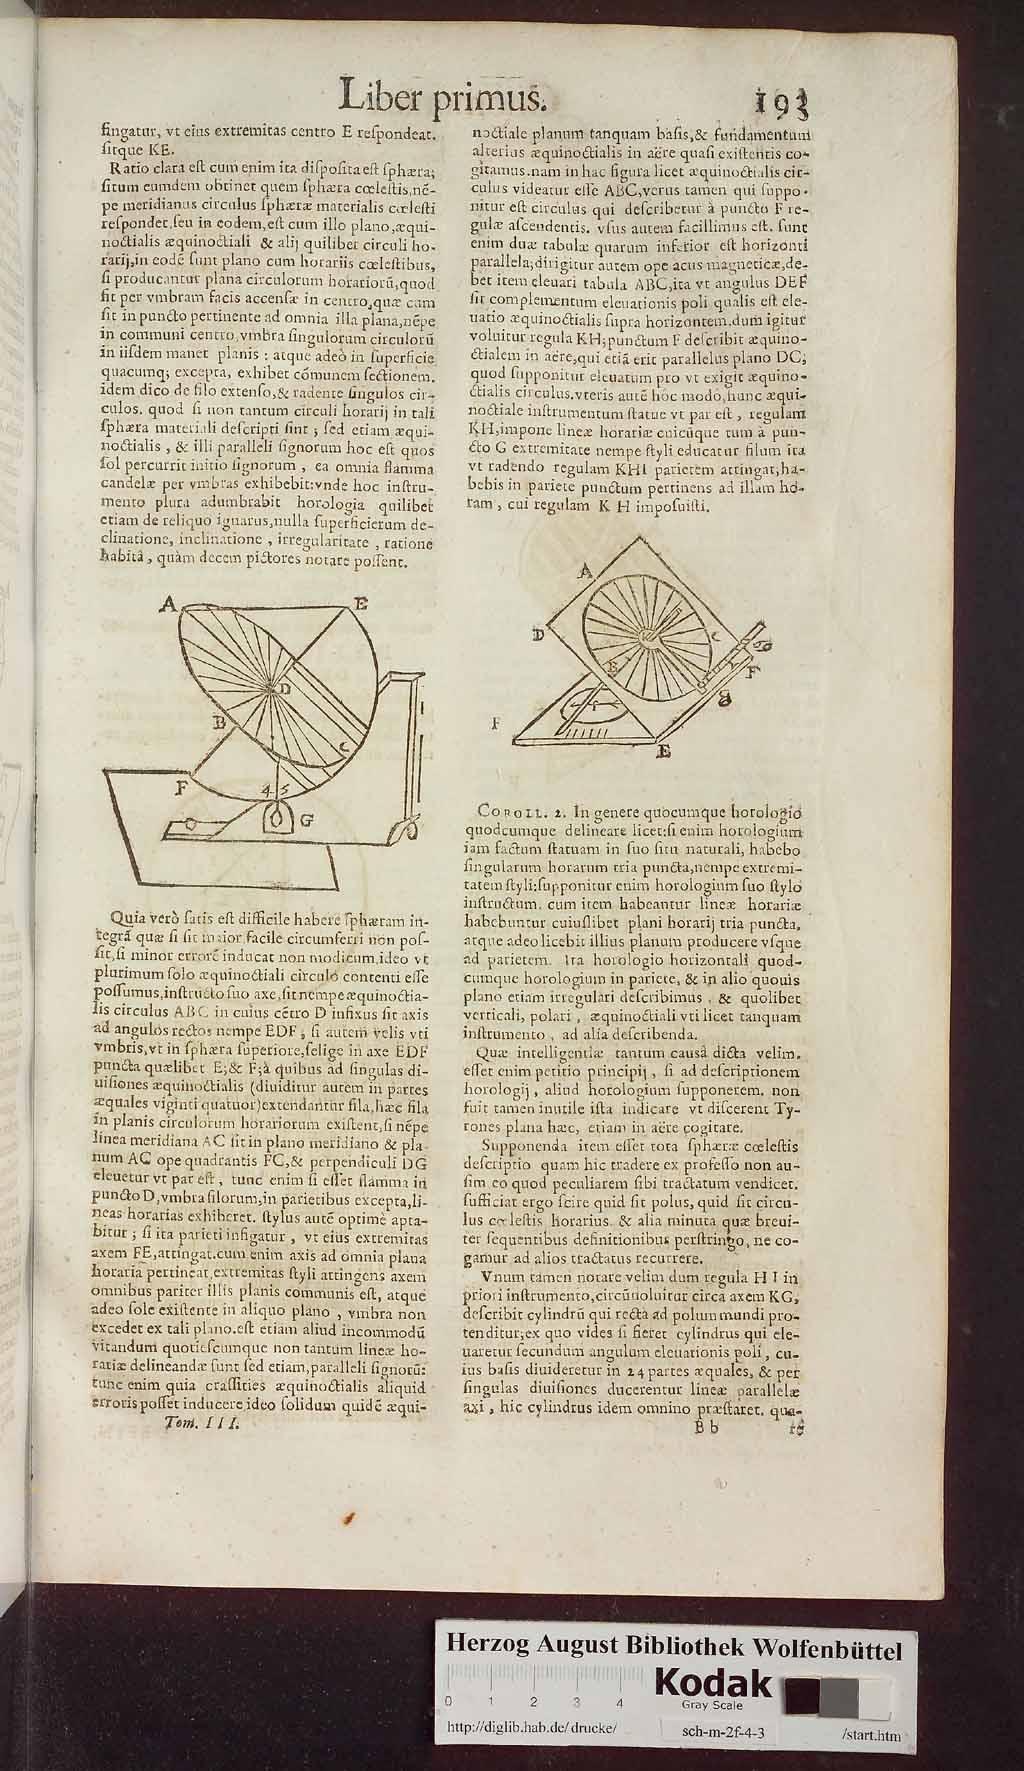 http://diglib.hab.de/drucke/sch-m-2f-4-3/00233.jpg